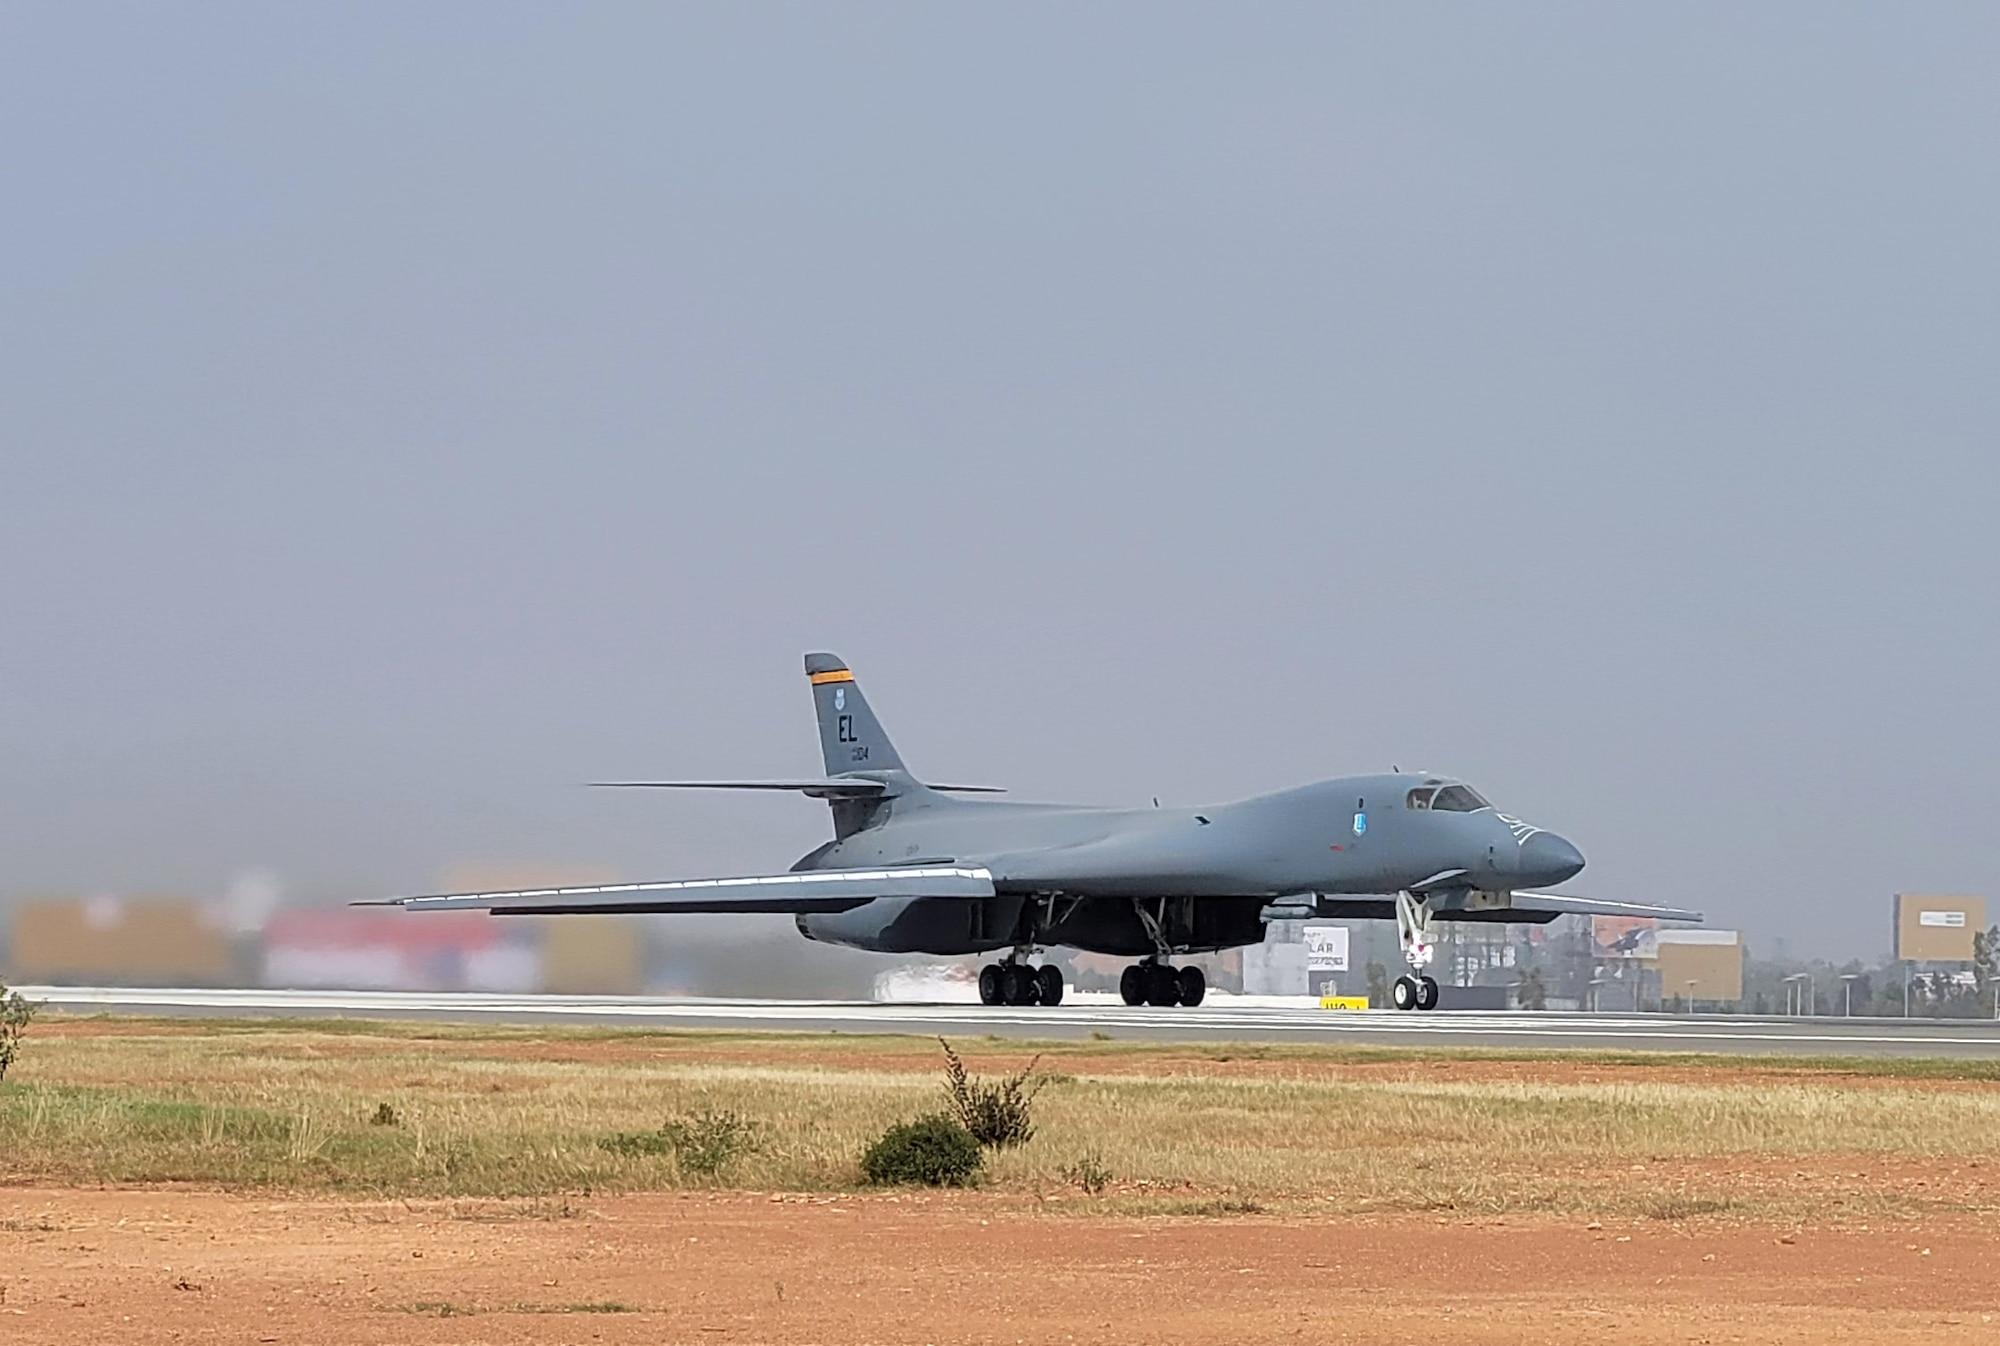 Aero India 2021 Imagery